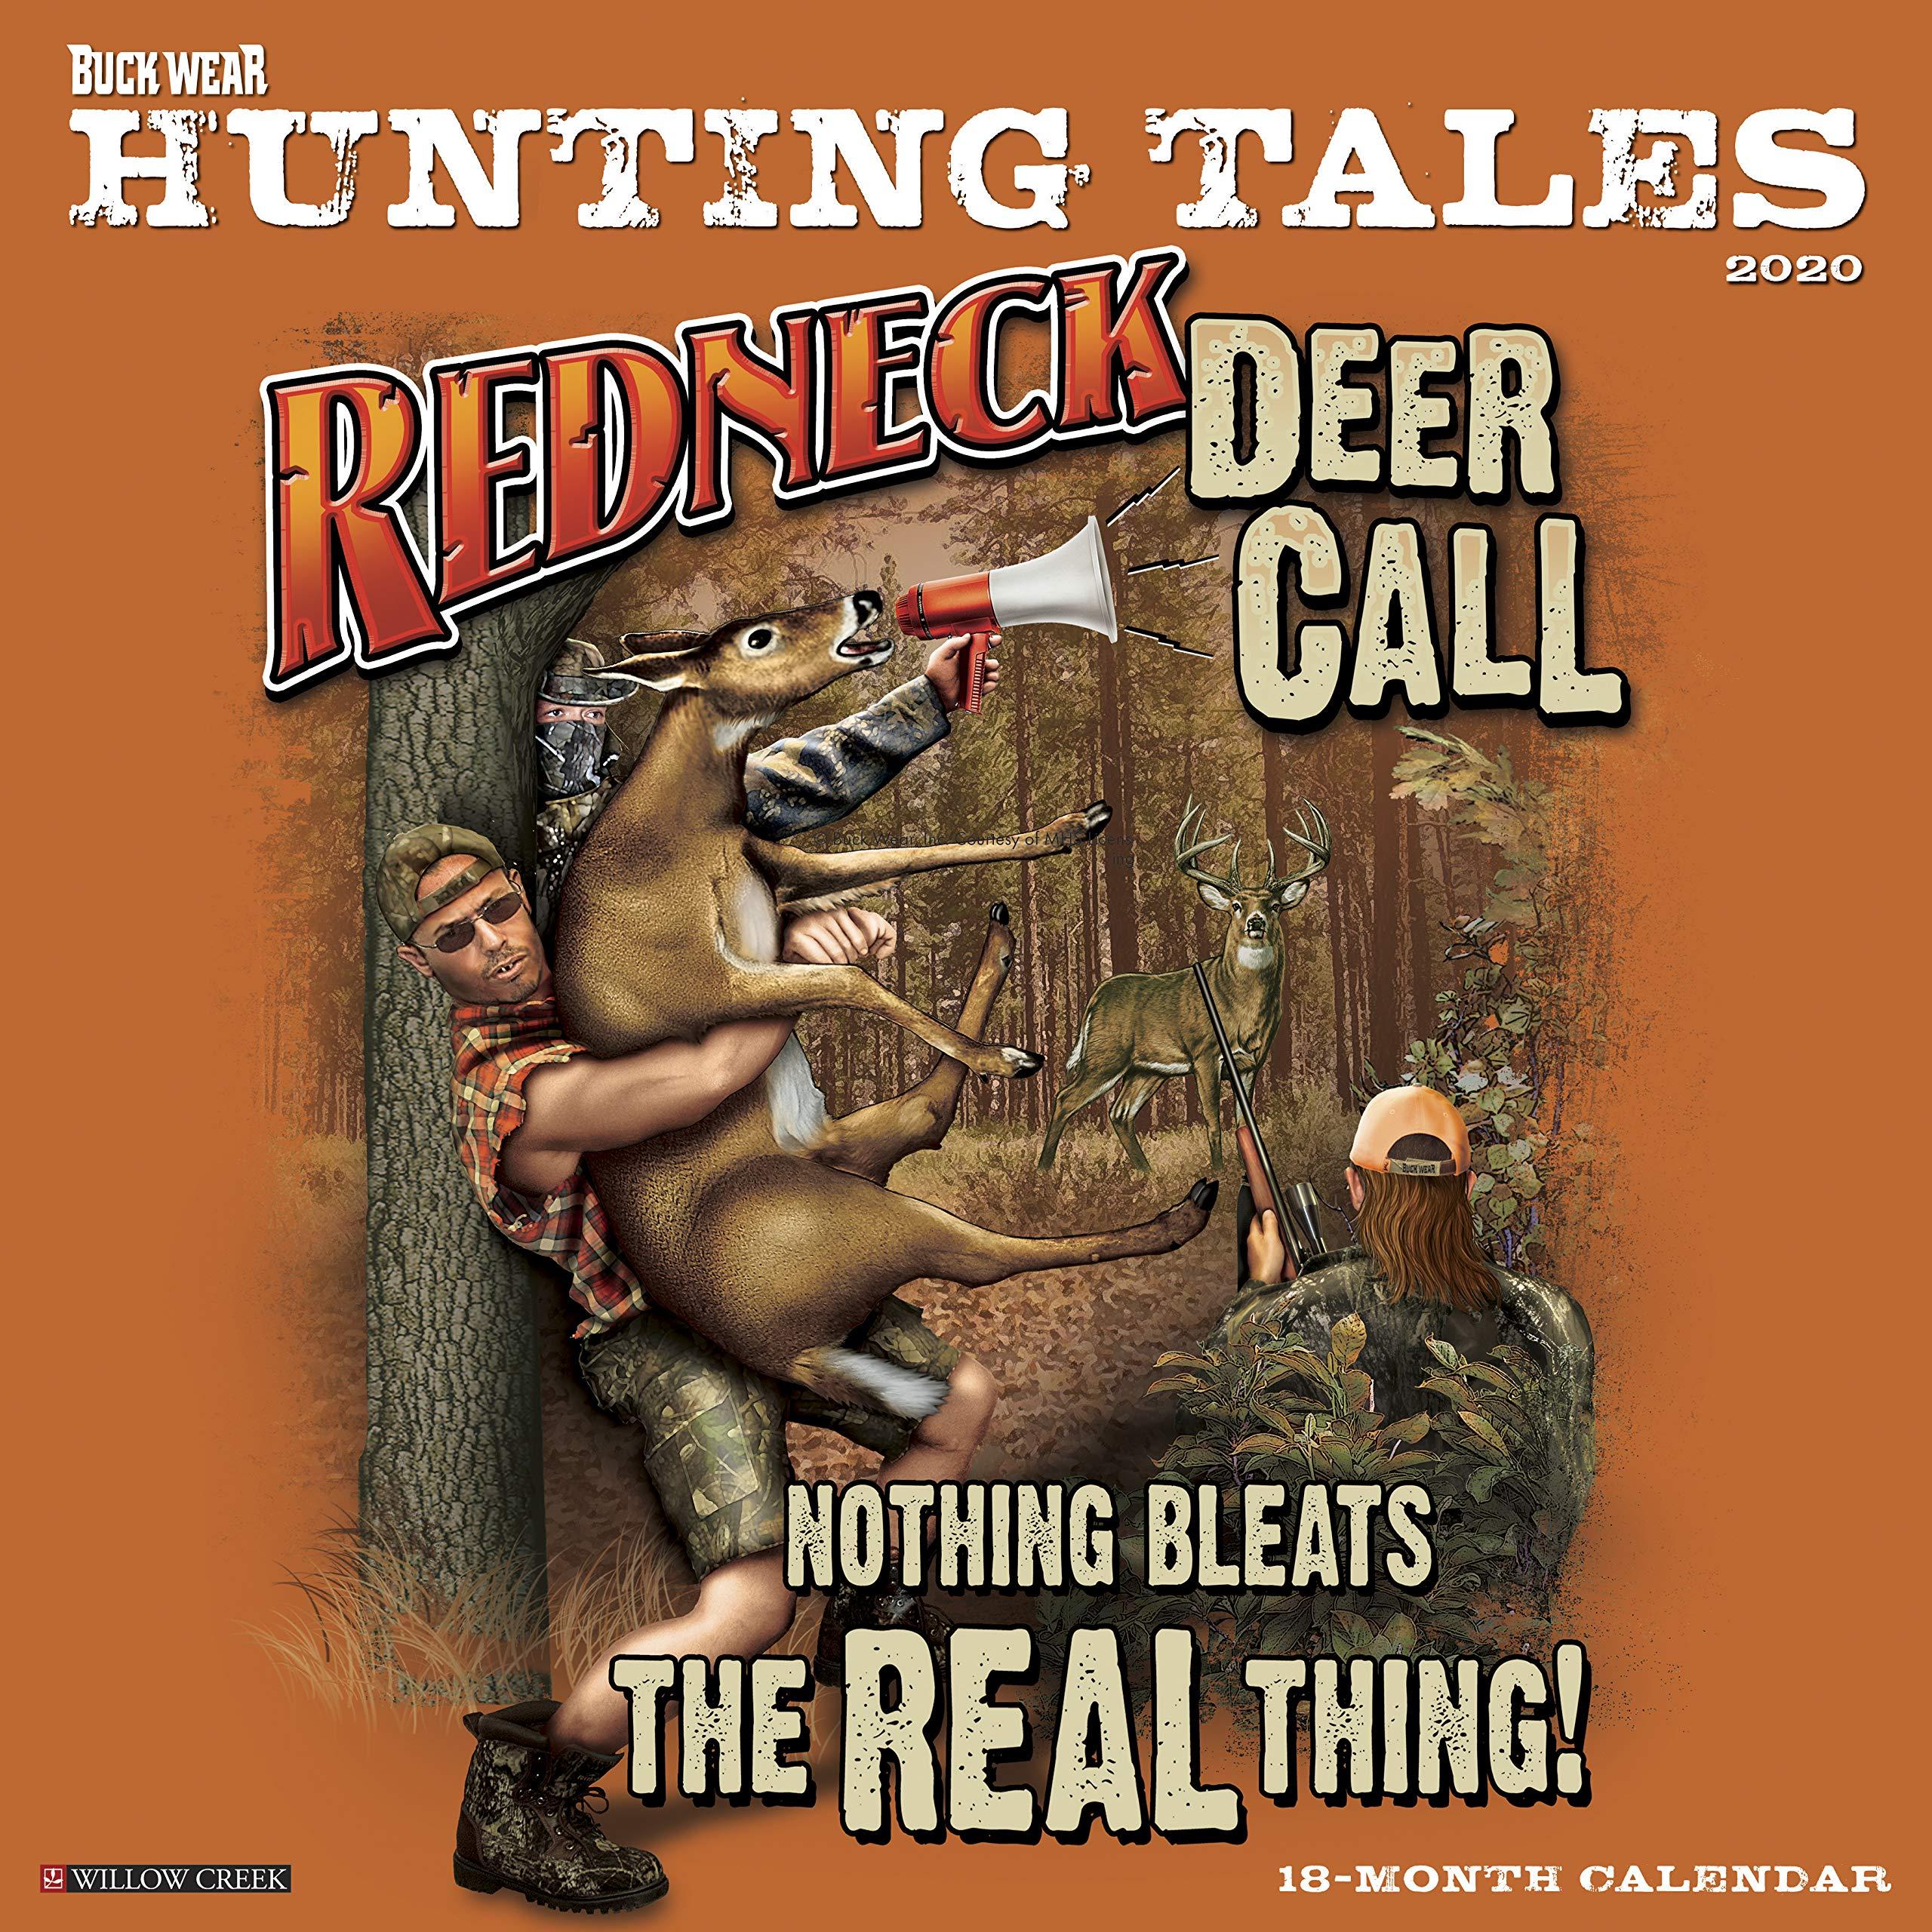 Hunting Calendar 2020 Buck Wear's Hunting Tales 2020 Wall Calendar: Buckwear